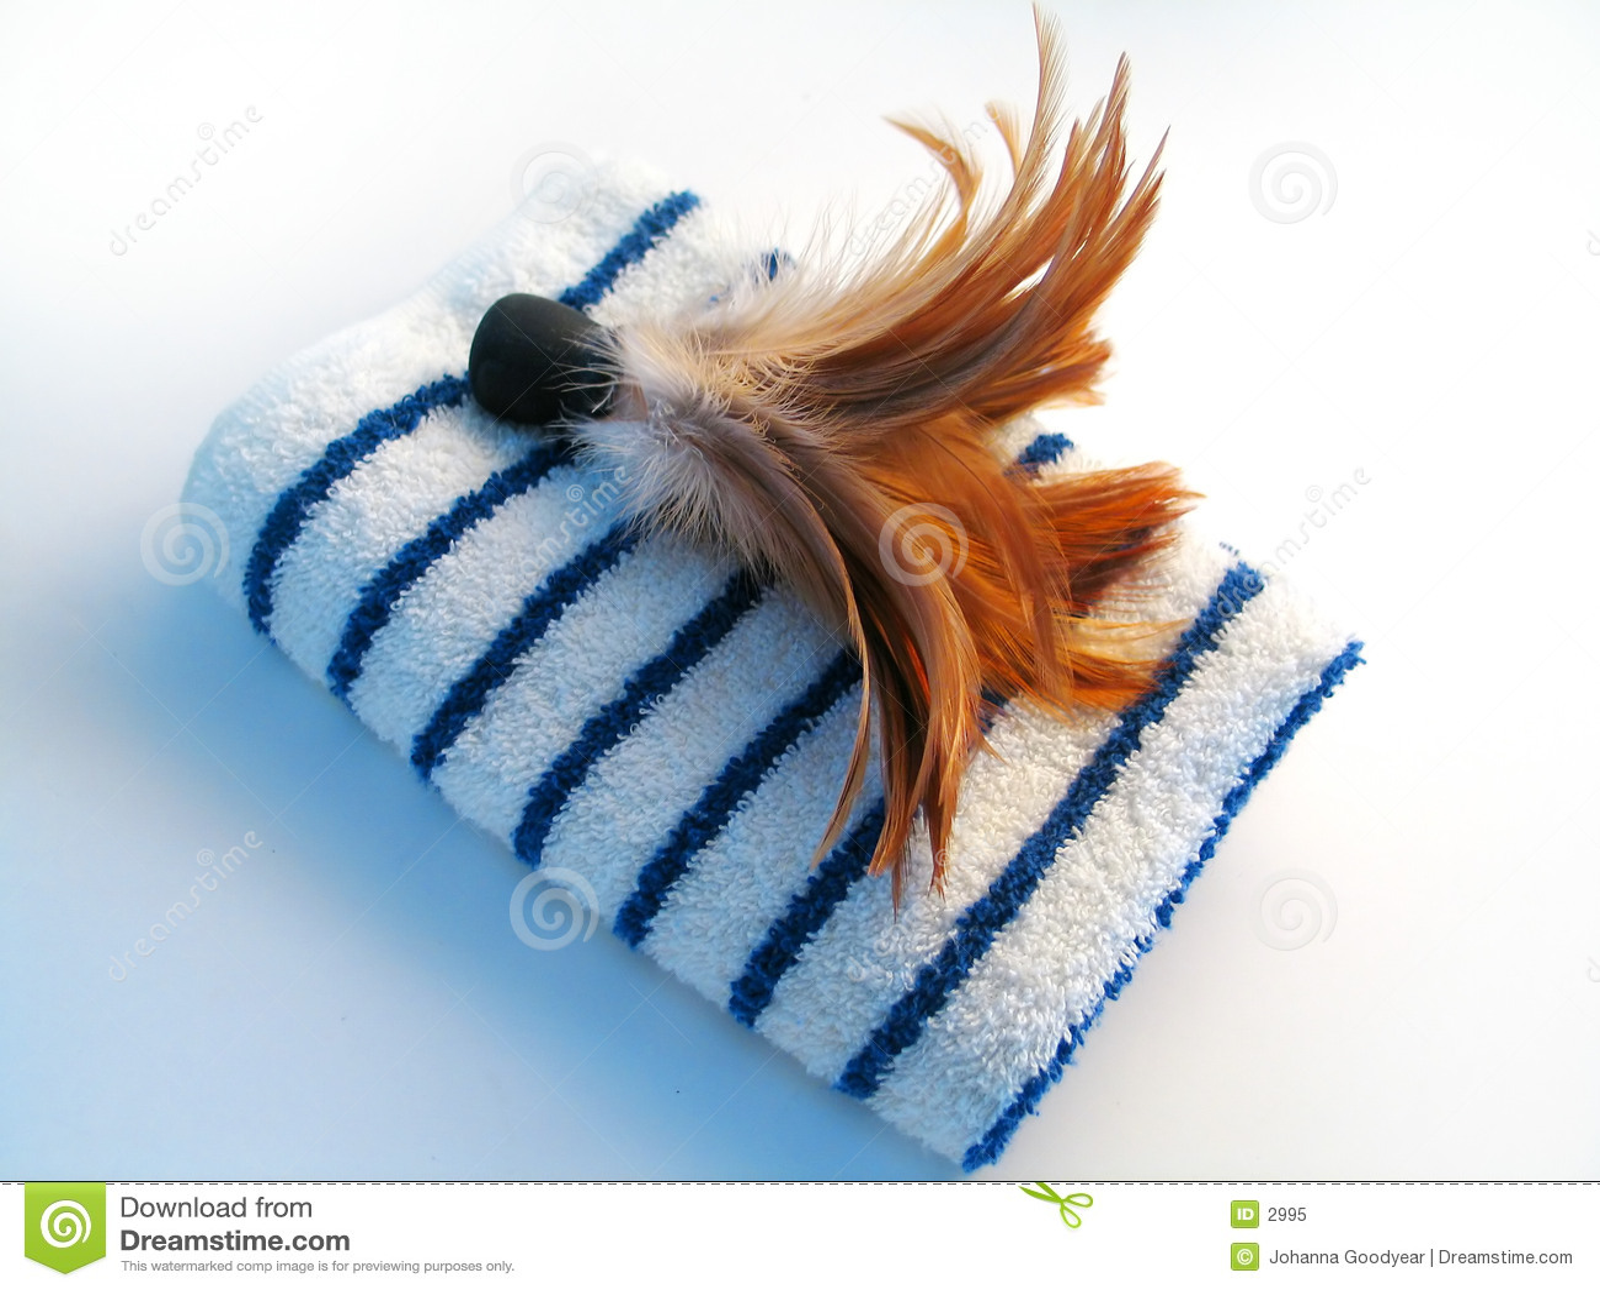 掠过羽毛毛巾